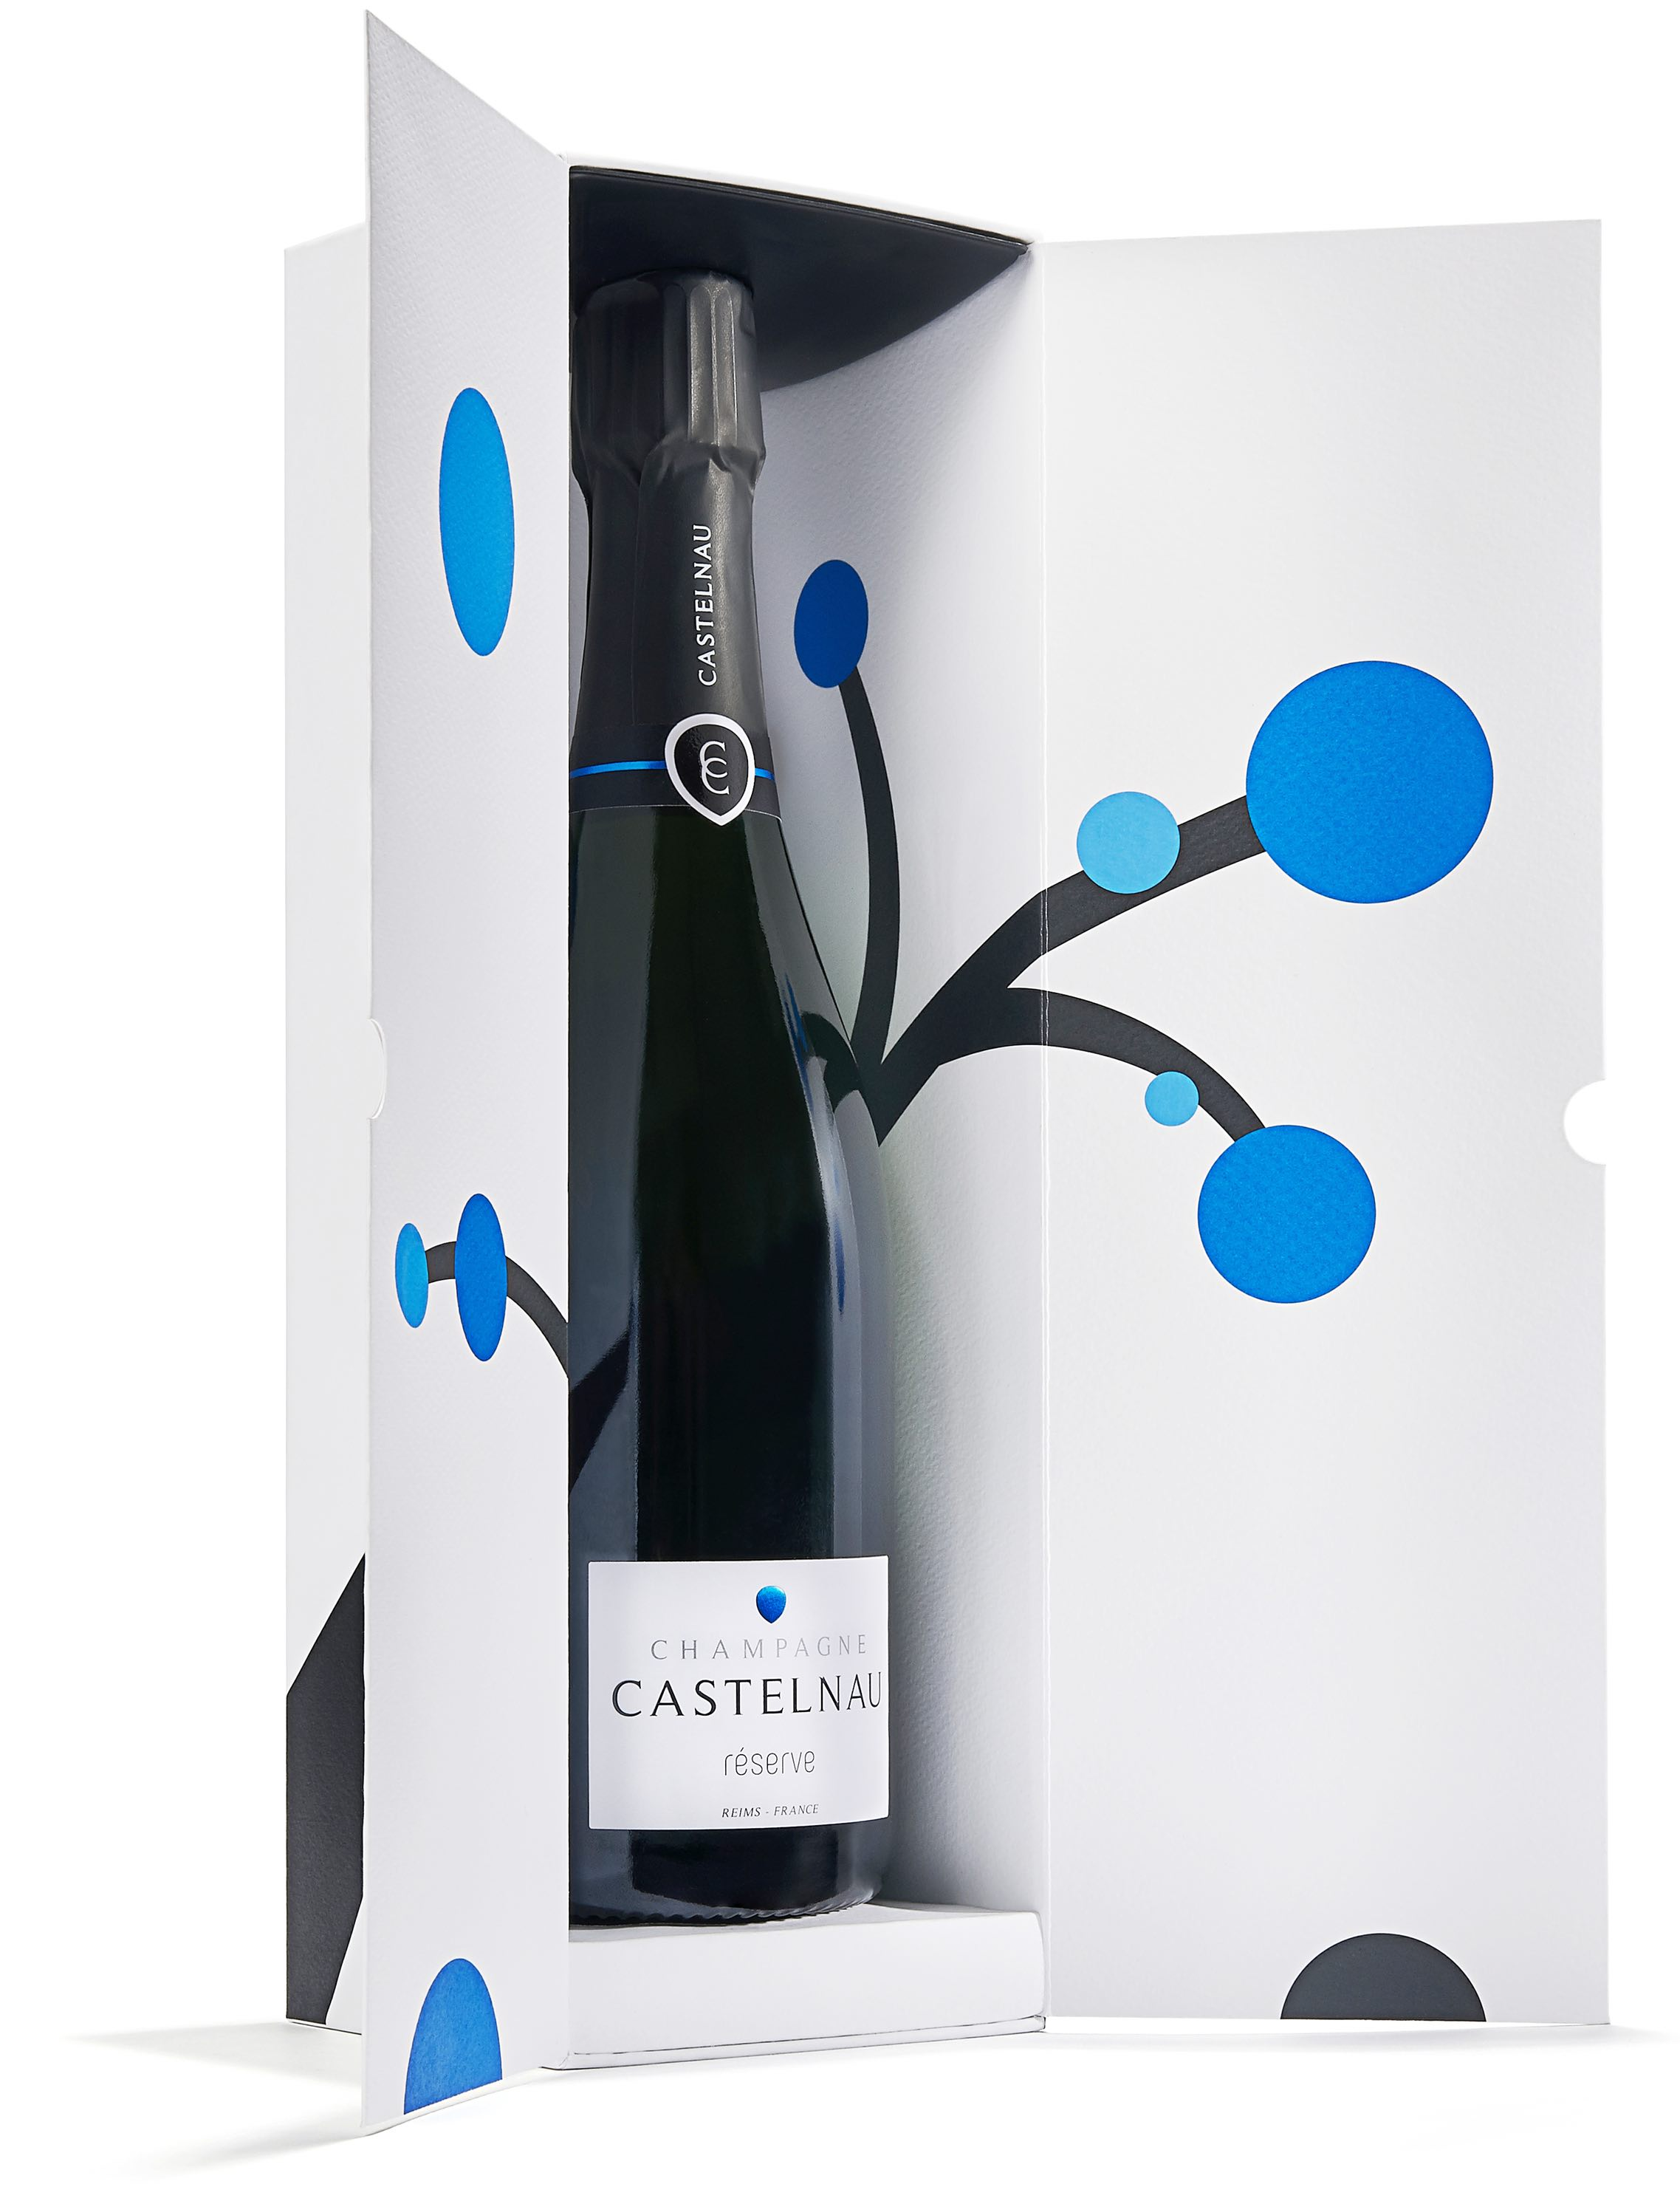 champagne-Castelnau-la-revue-y-1